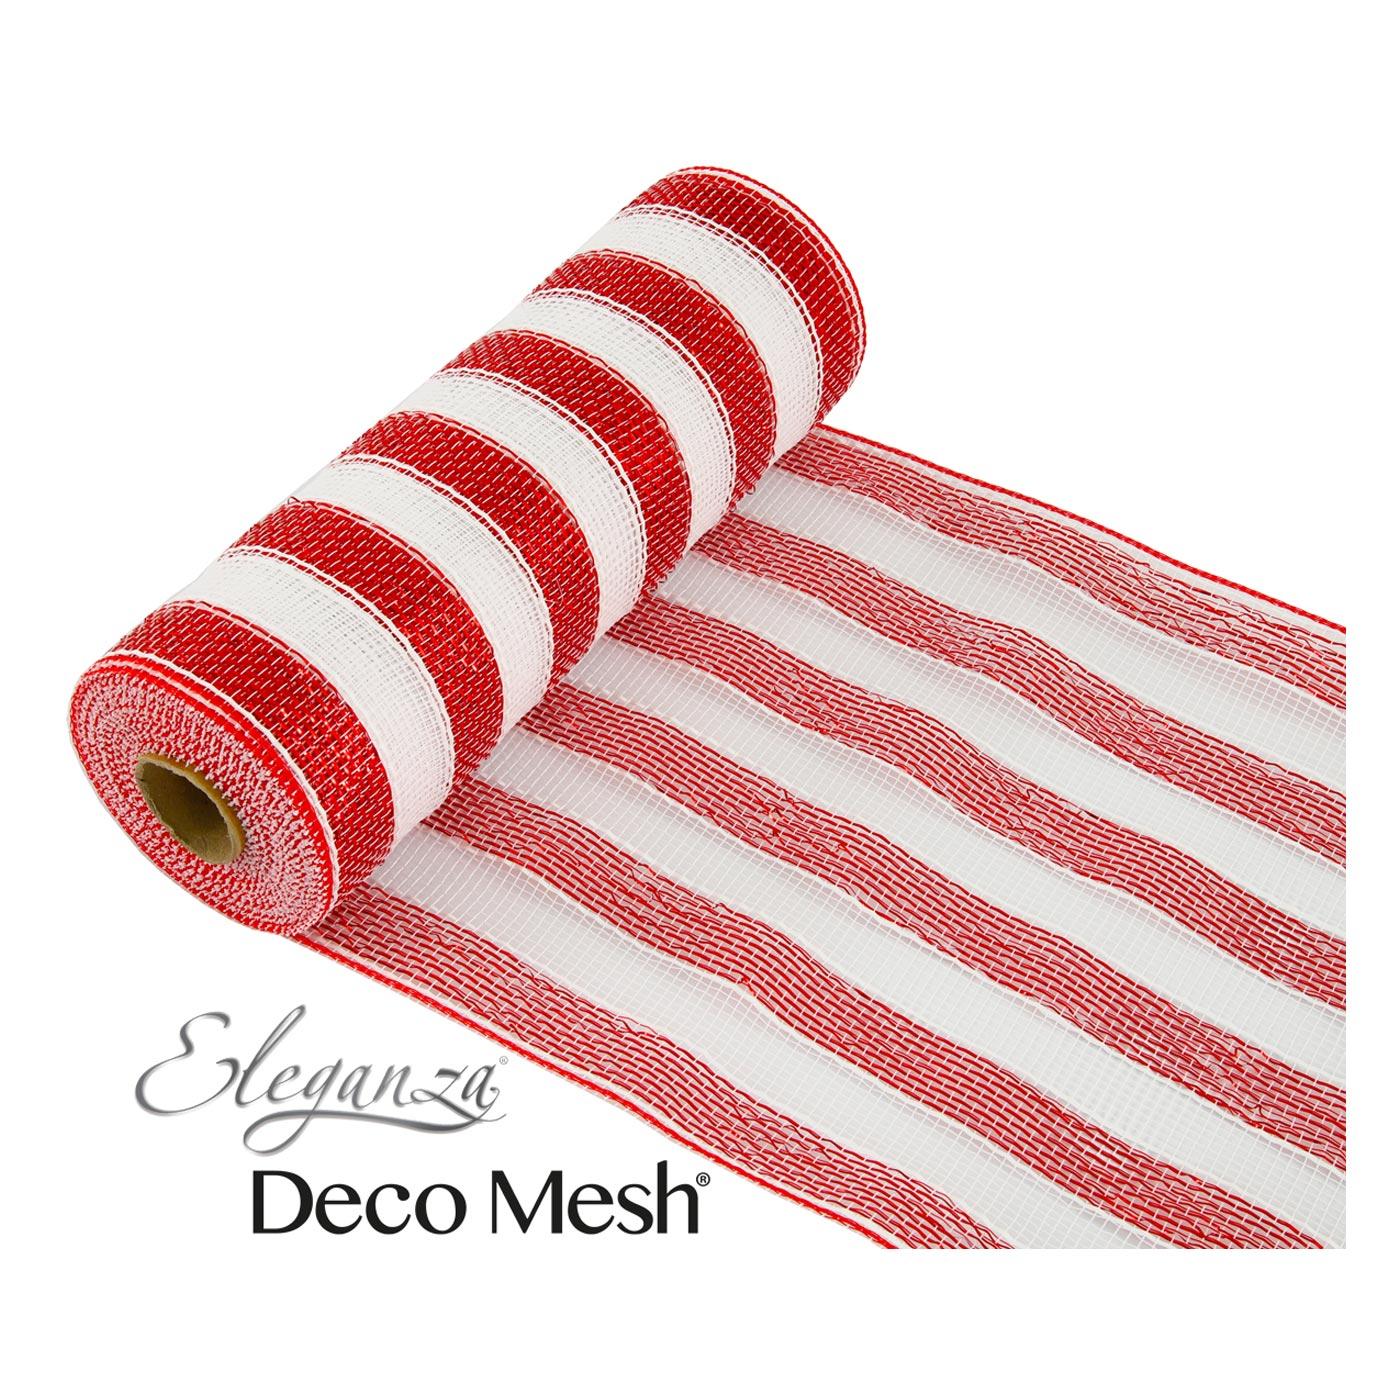 Deco Mesh Red and White Stripe